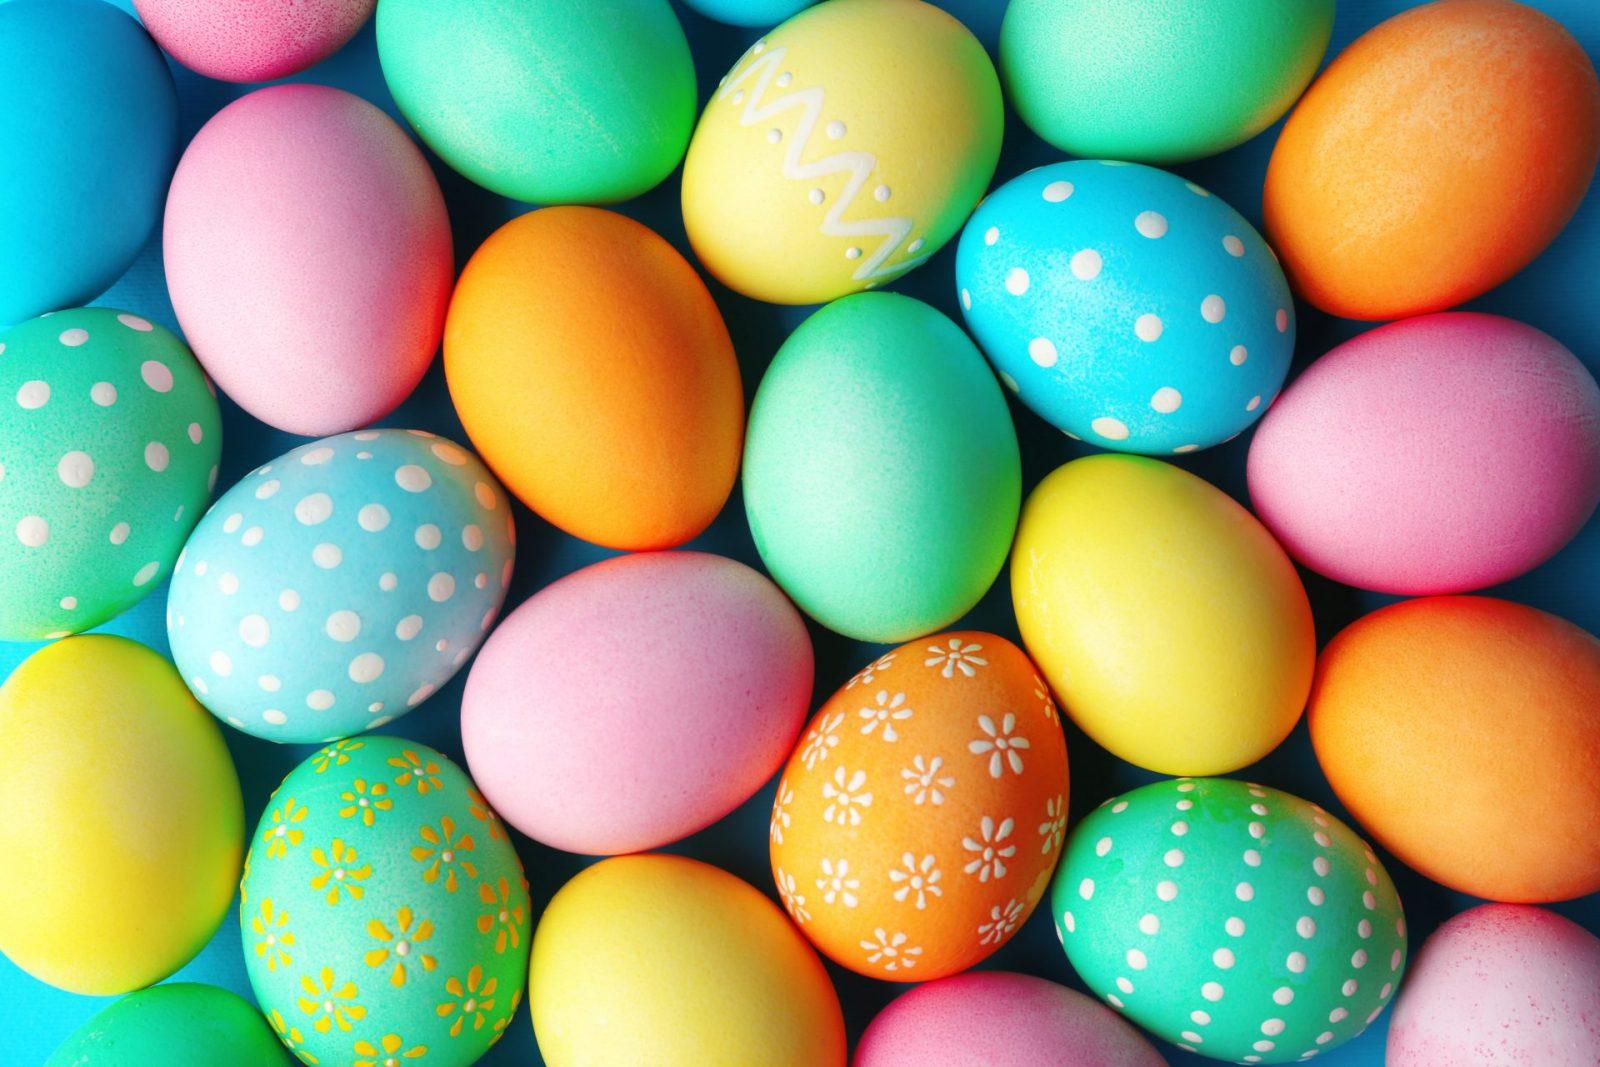 Recipes/Isite_Pics/easter-eggs.jpg